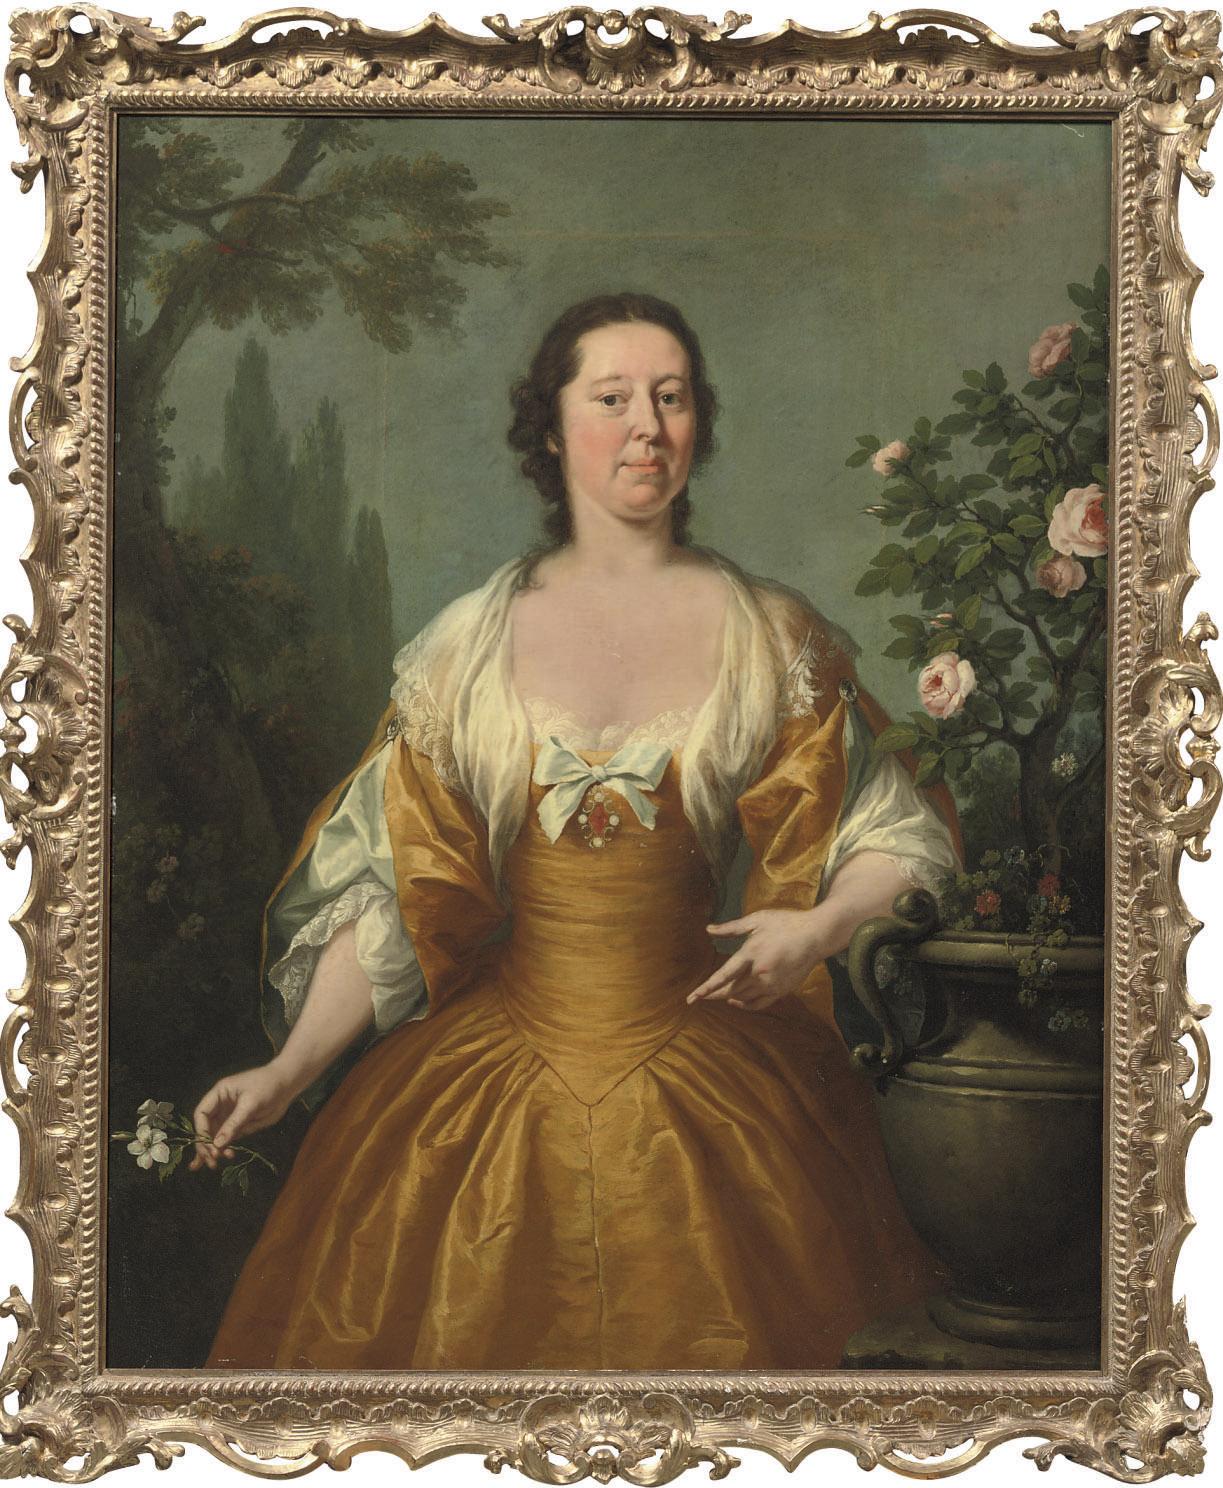 Joseph Highmore (London 1692-1